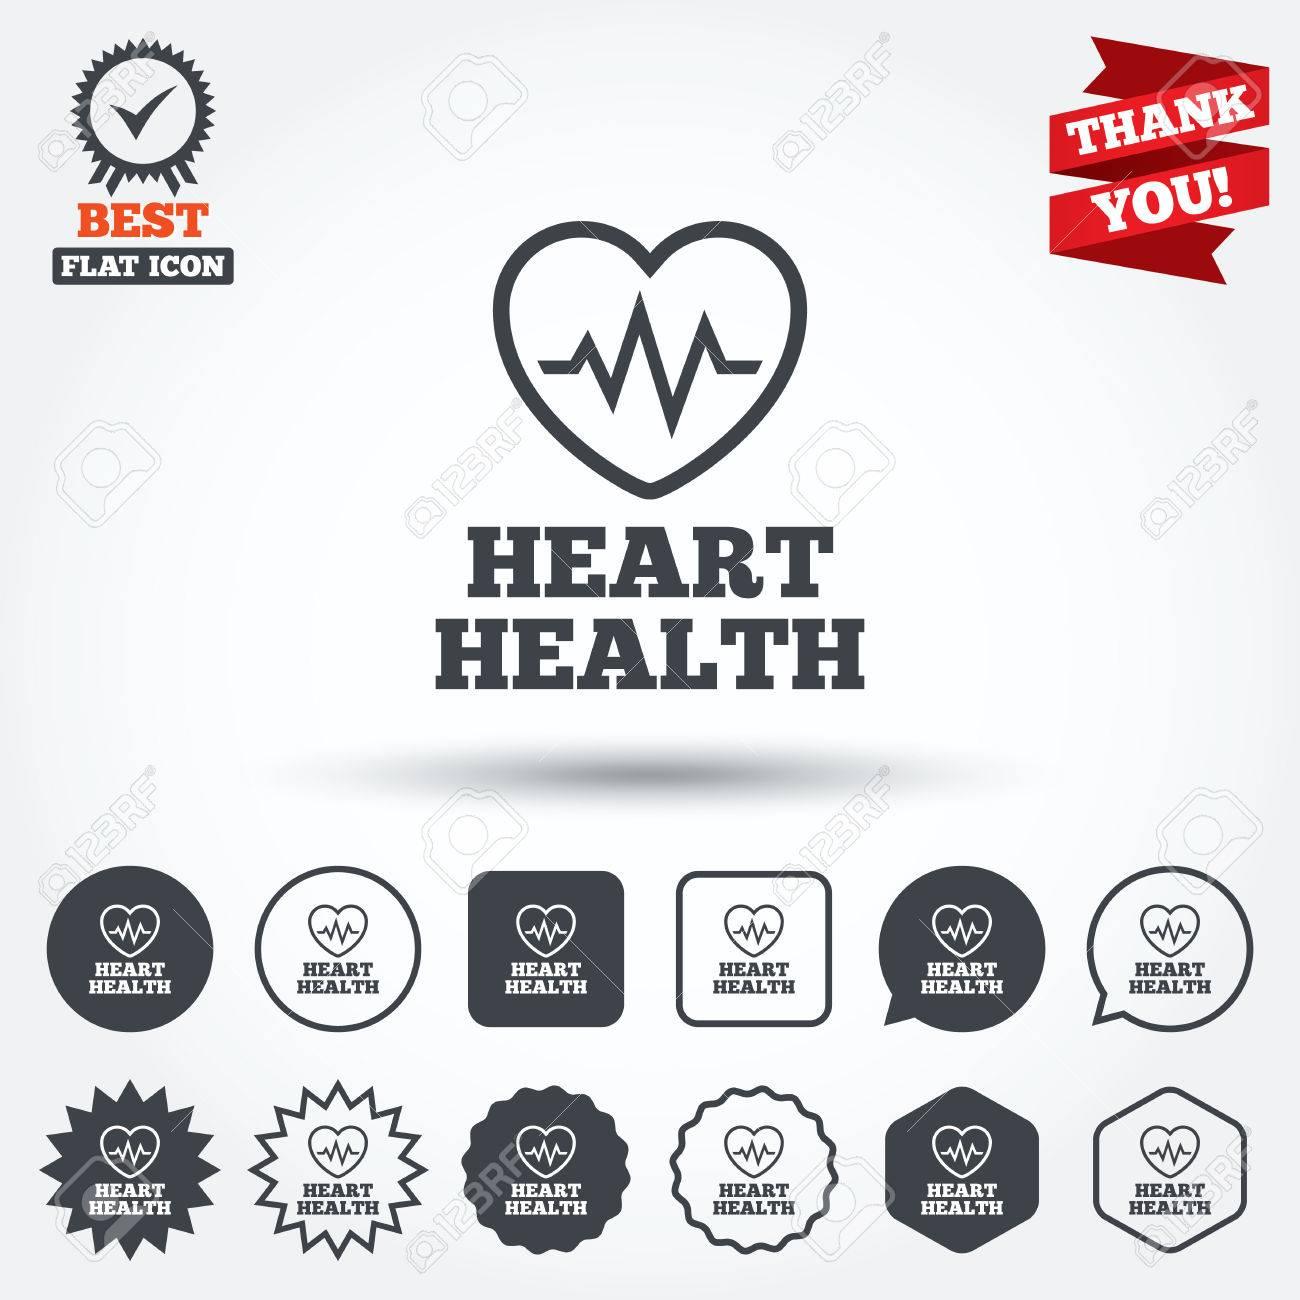 Heartbeat Sign Icon Heart Health Cardiogram Check Symbol Circle